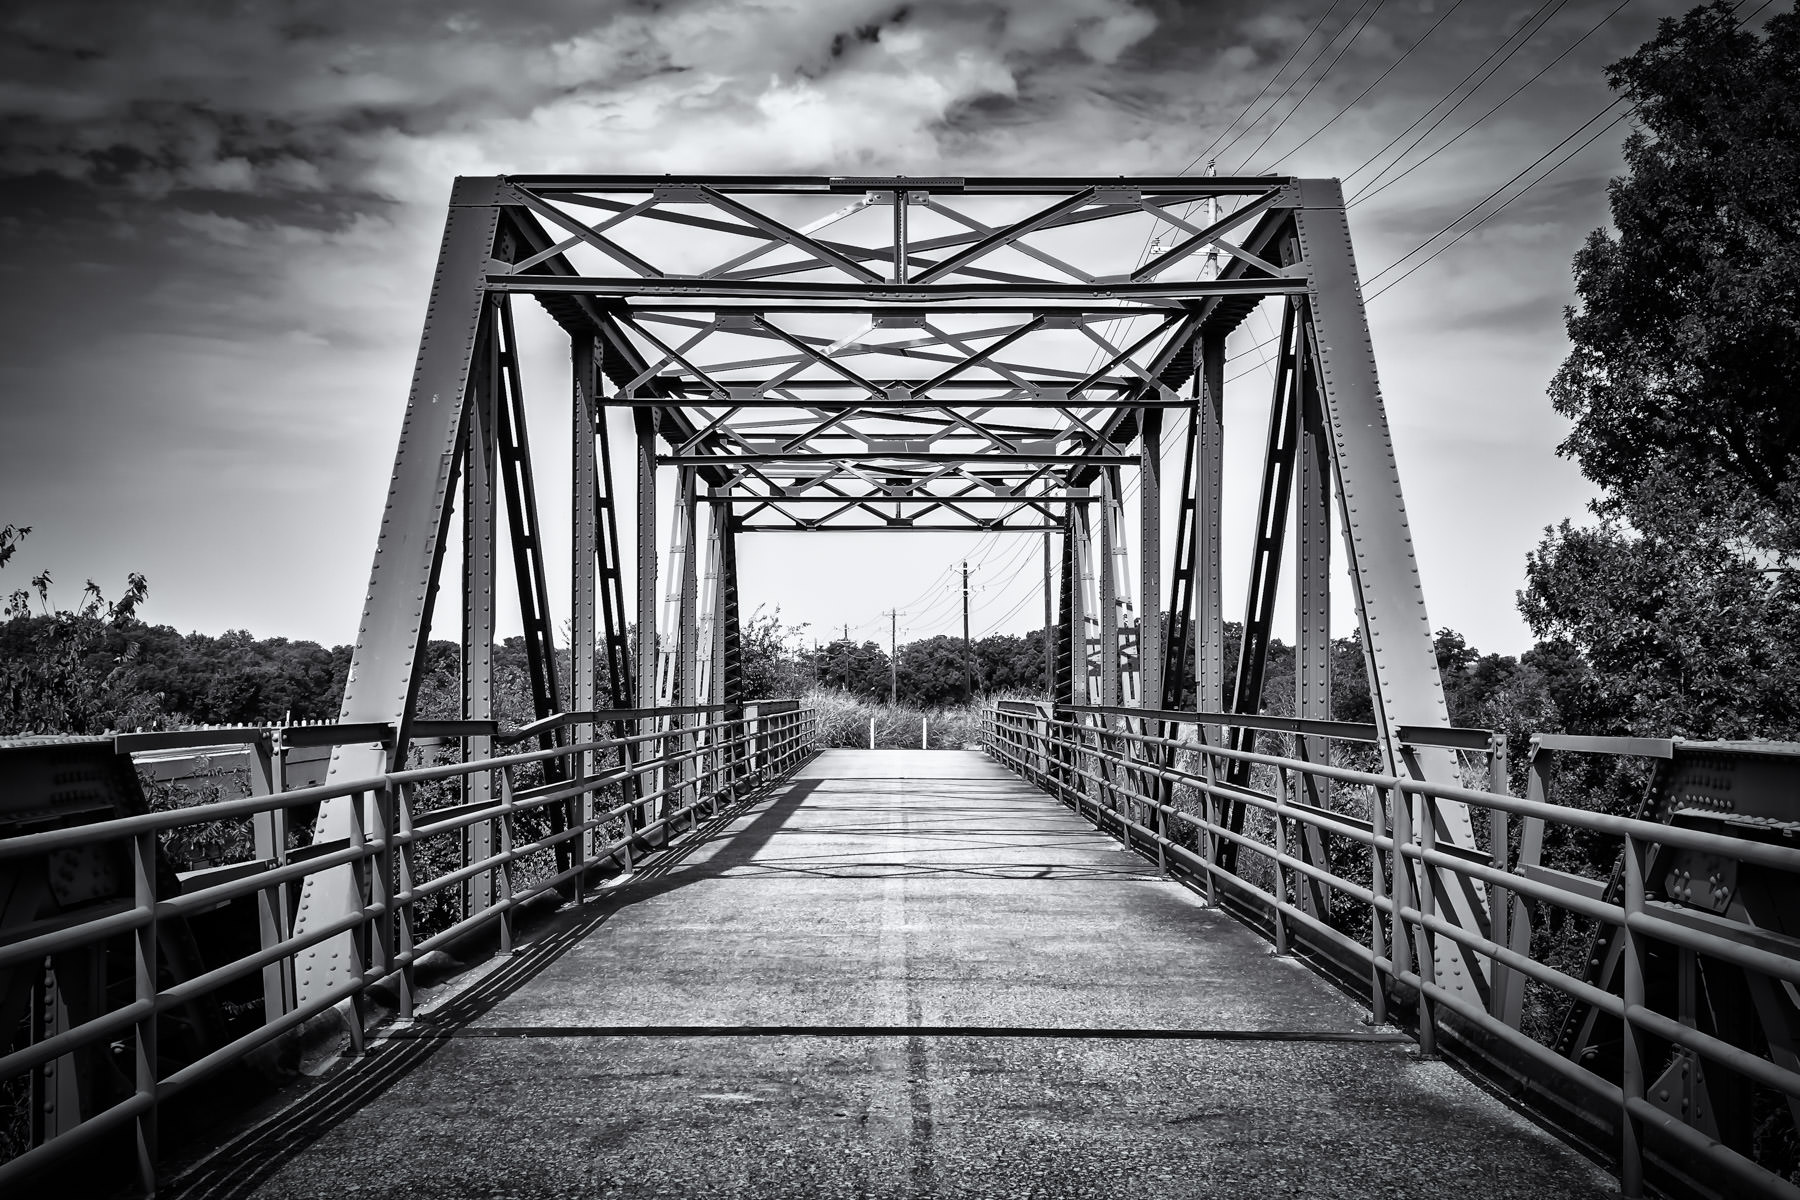 An iron pedestrian bridge spans the Elm Fork of the Trinity River near Aubrey, Texas.